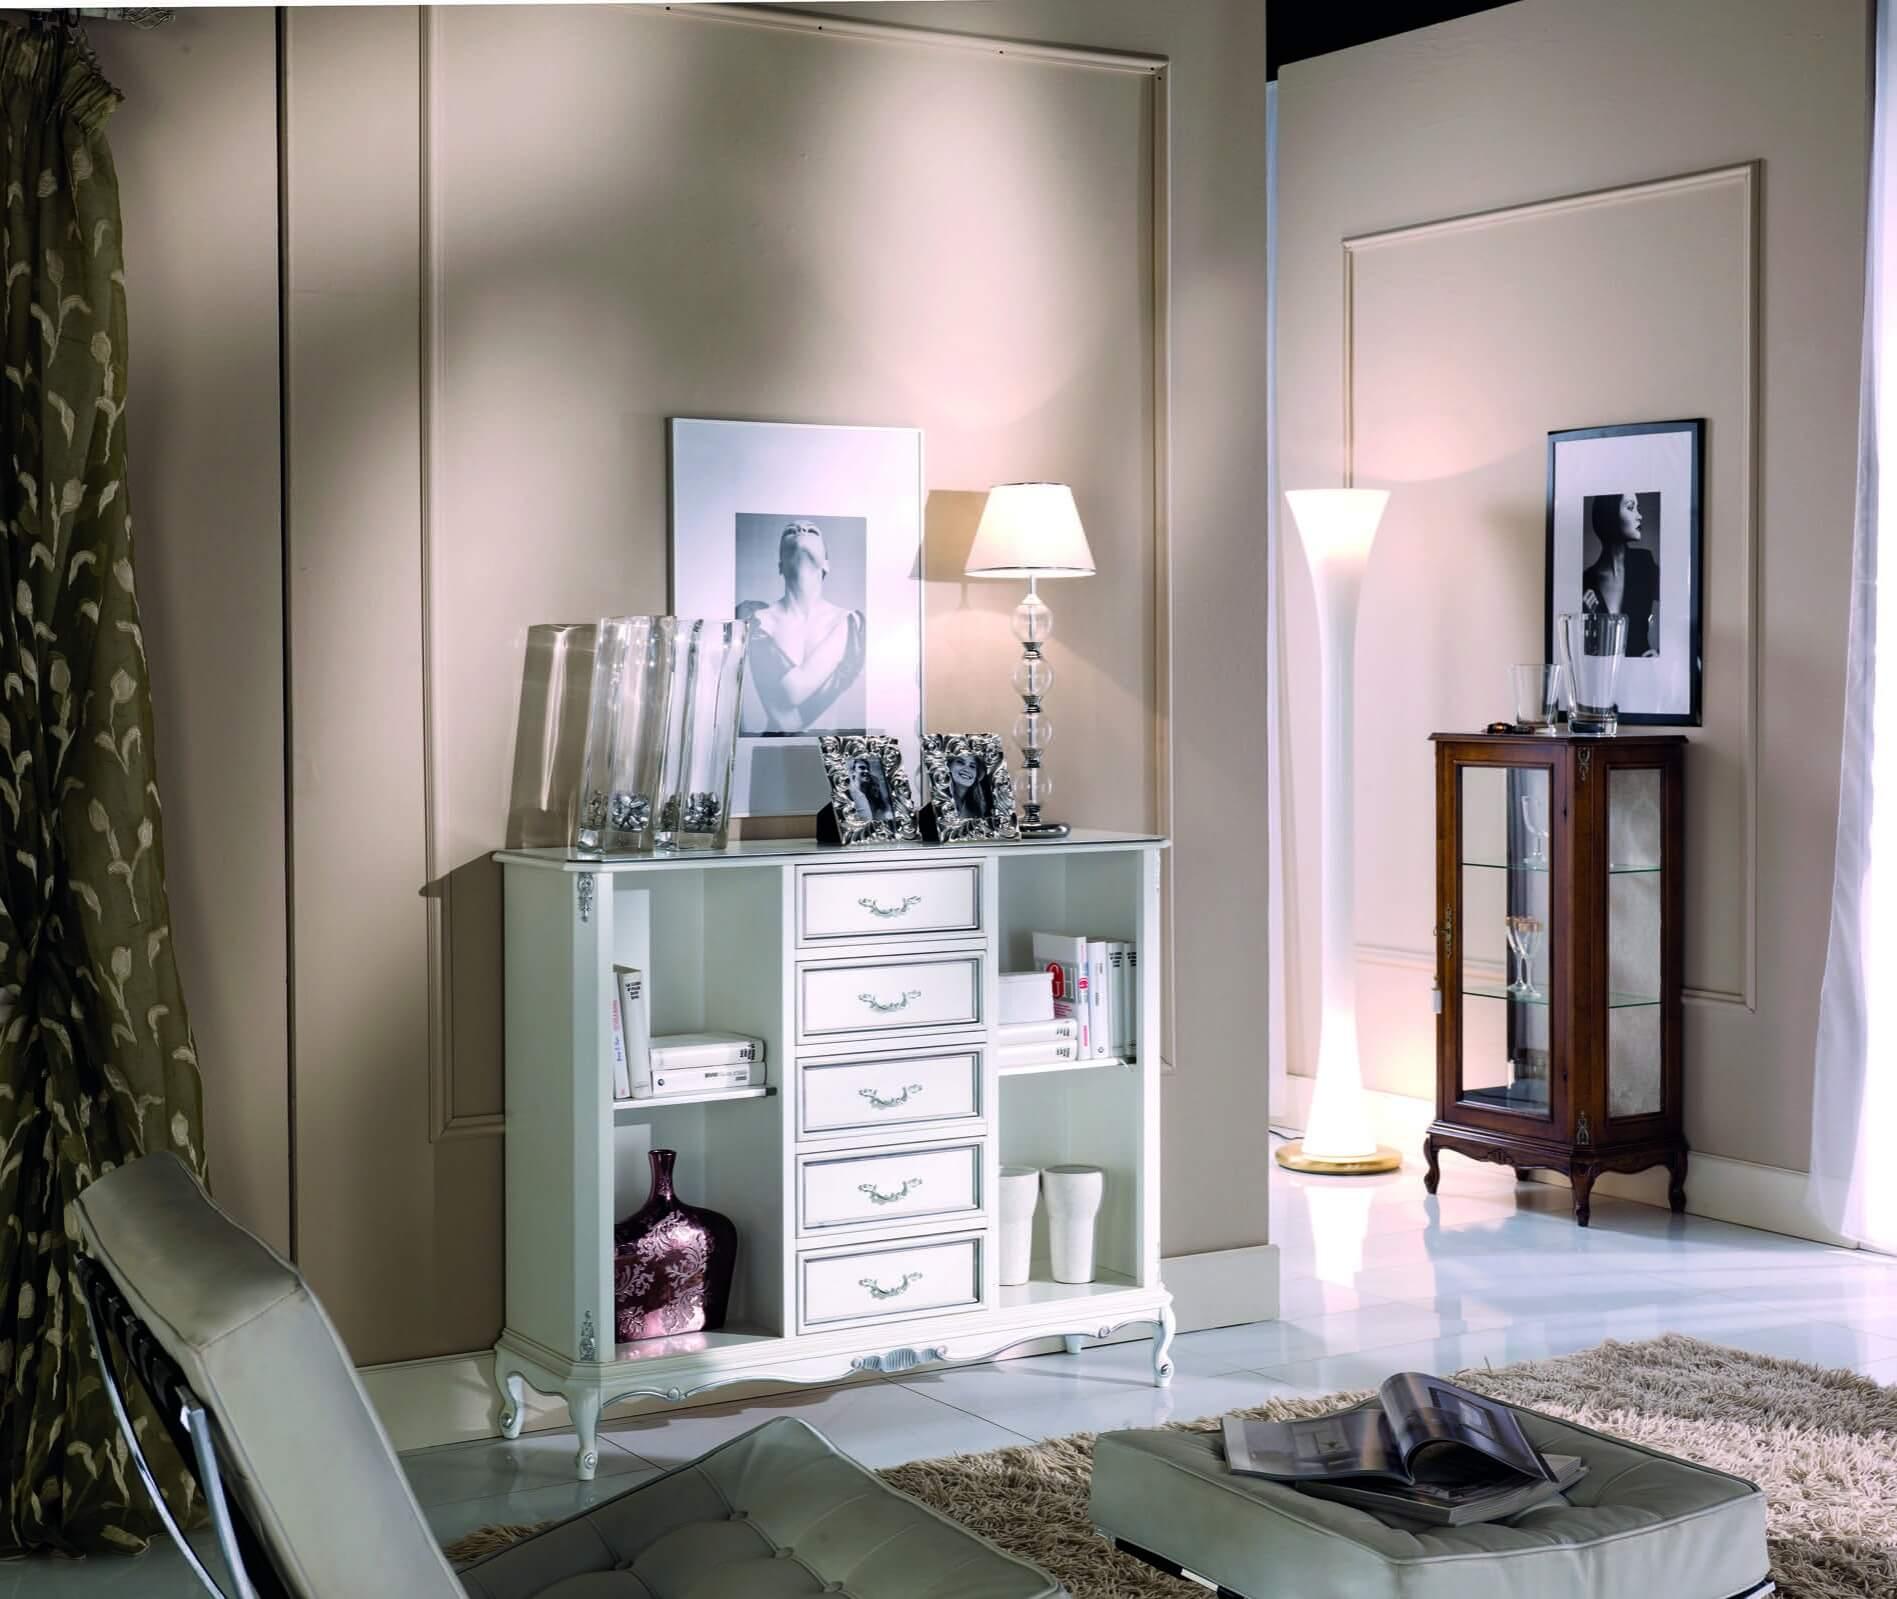 anrichte walter ph nix sch ner leben. Black Bedroom Furniture Sets. Home Design Ideas